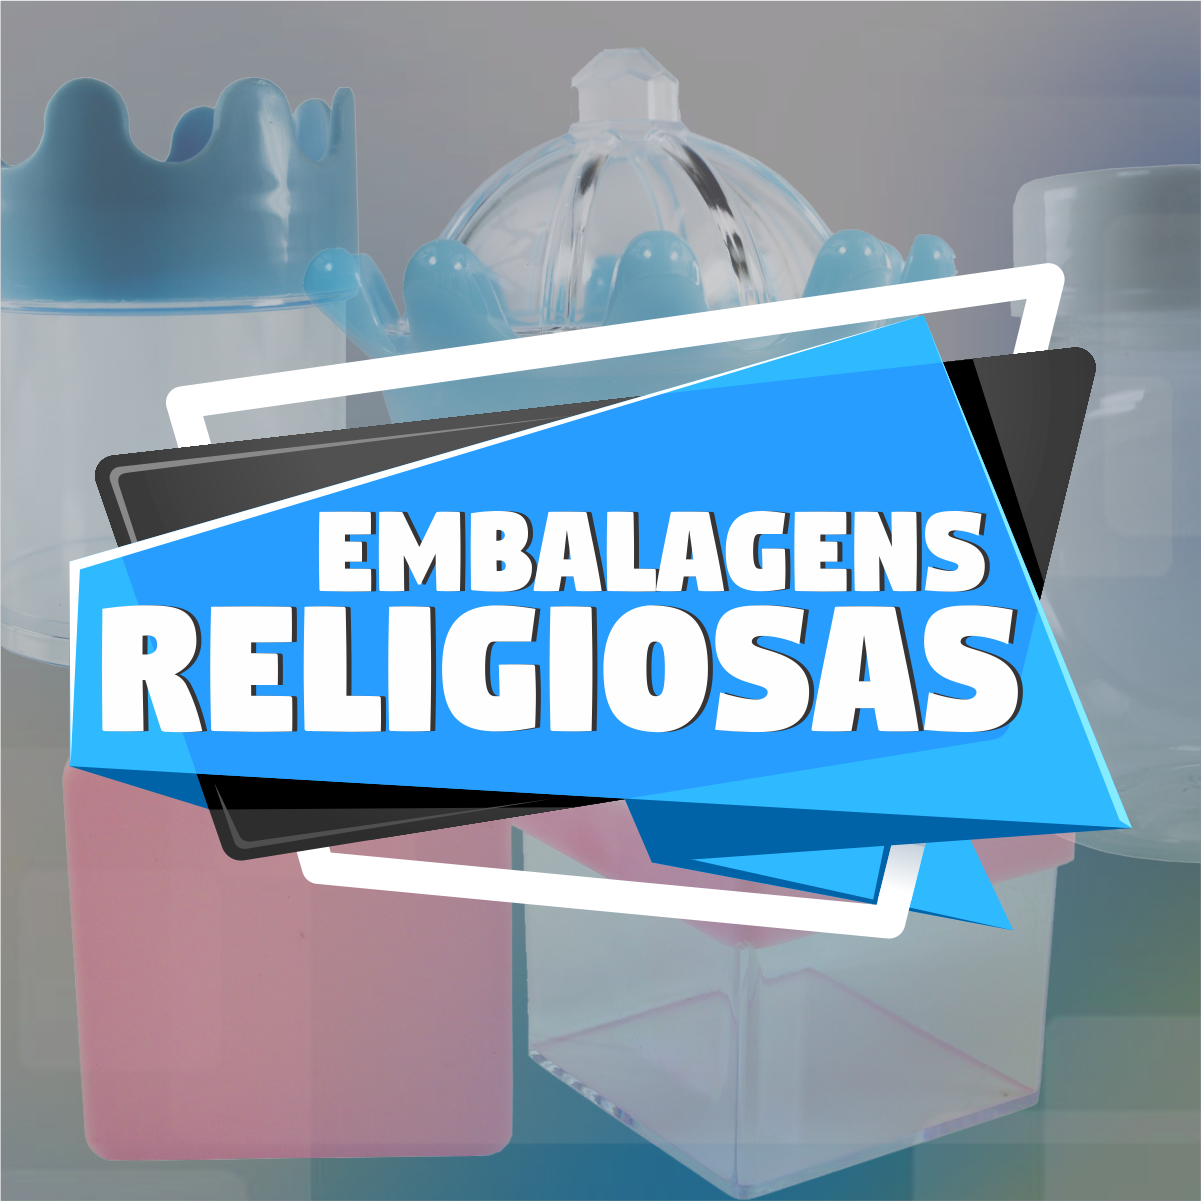 Embalagens Religiosas